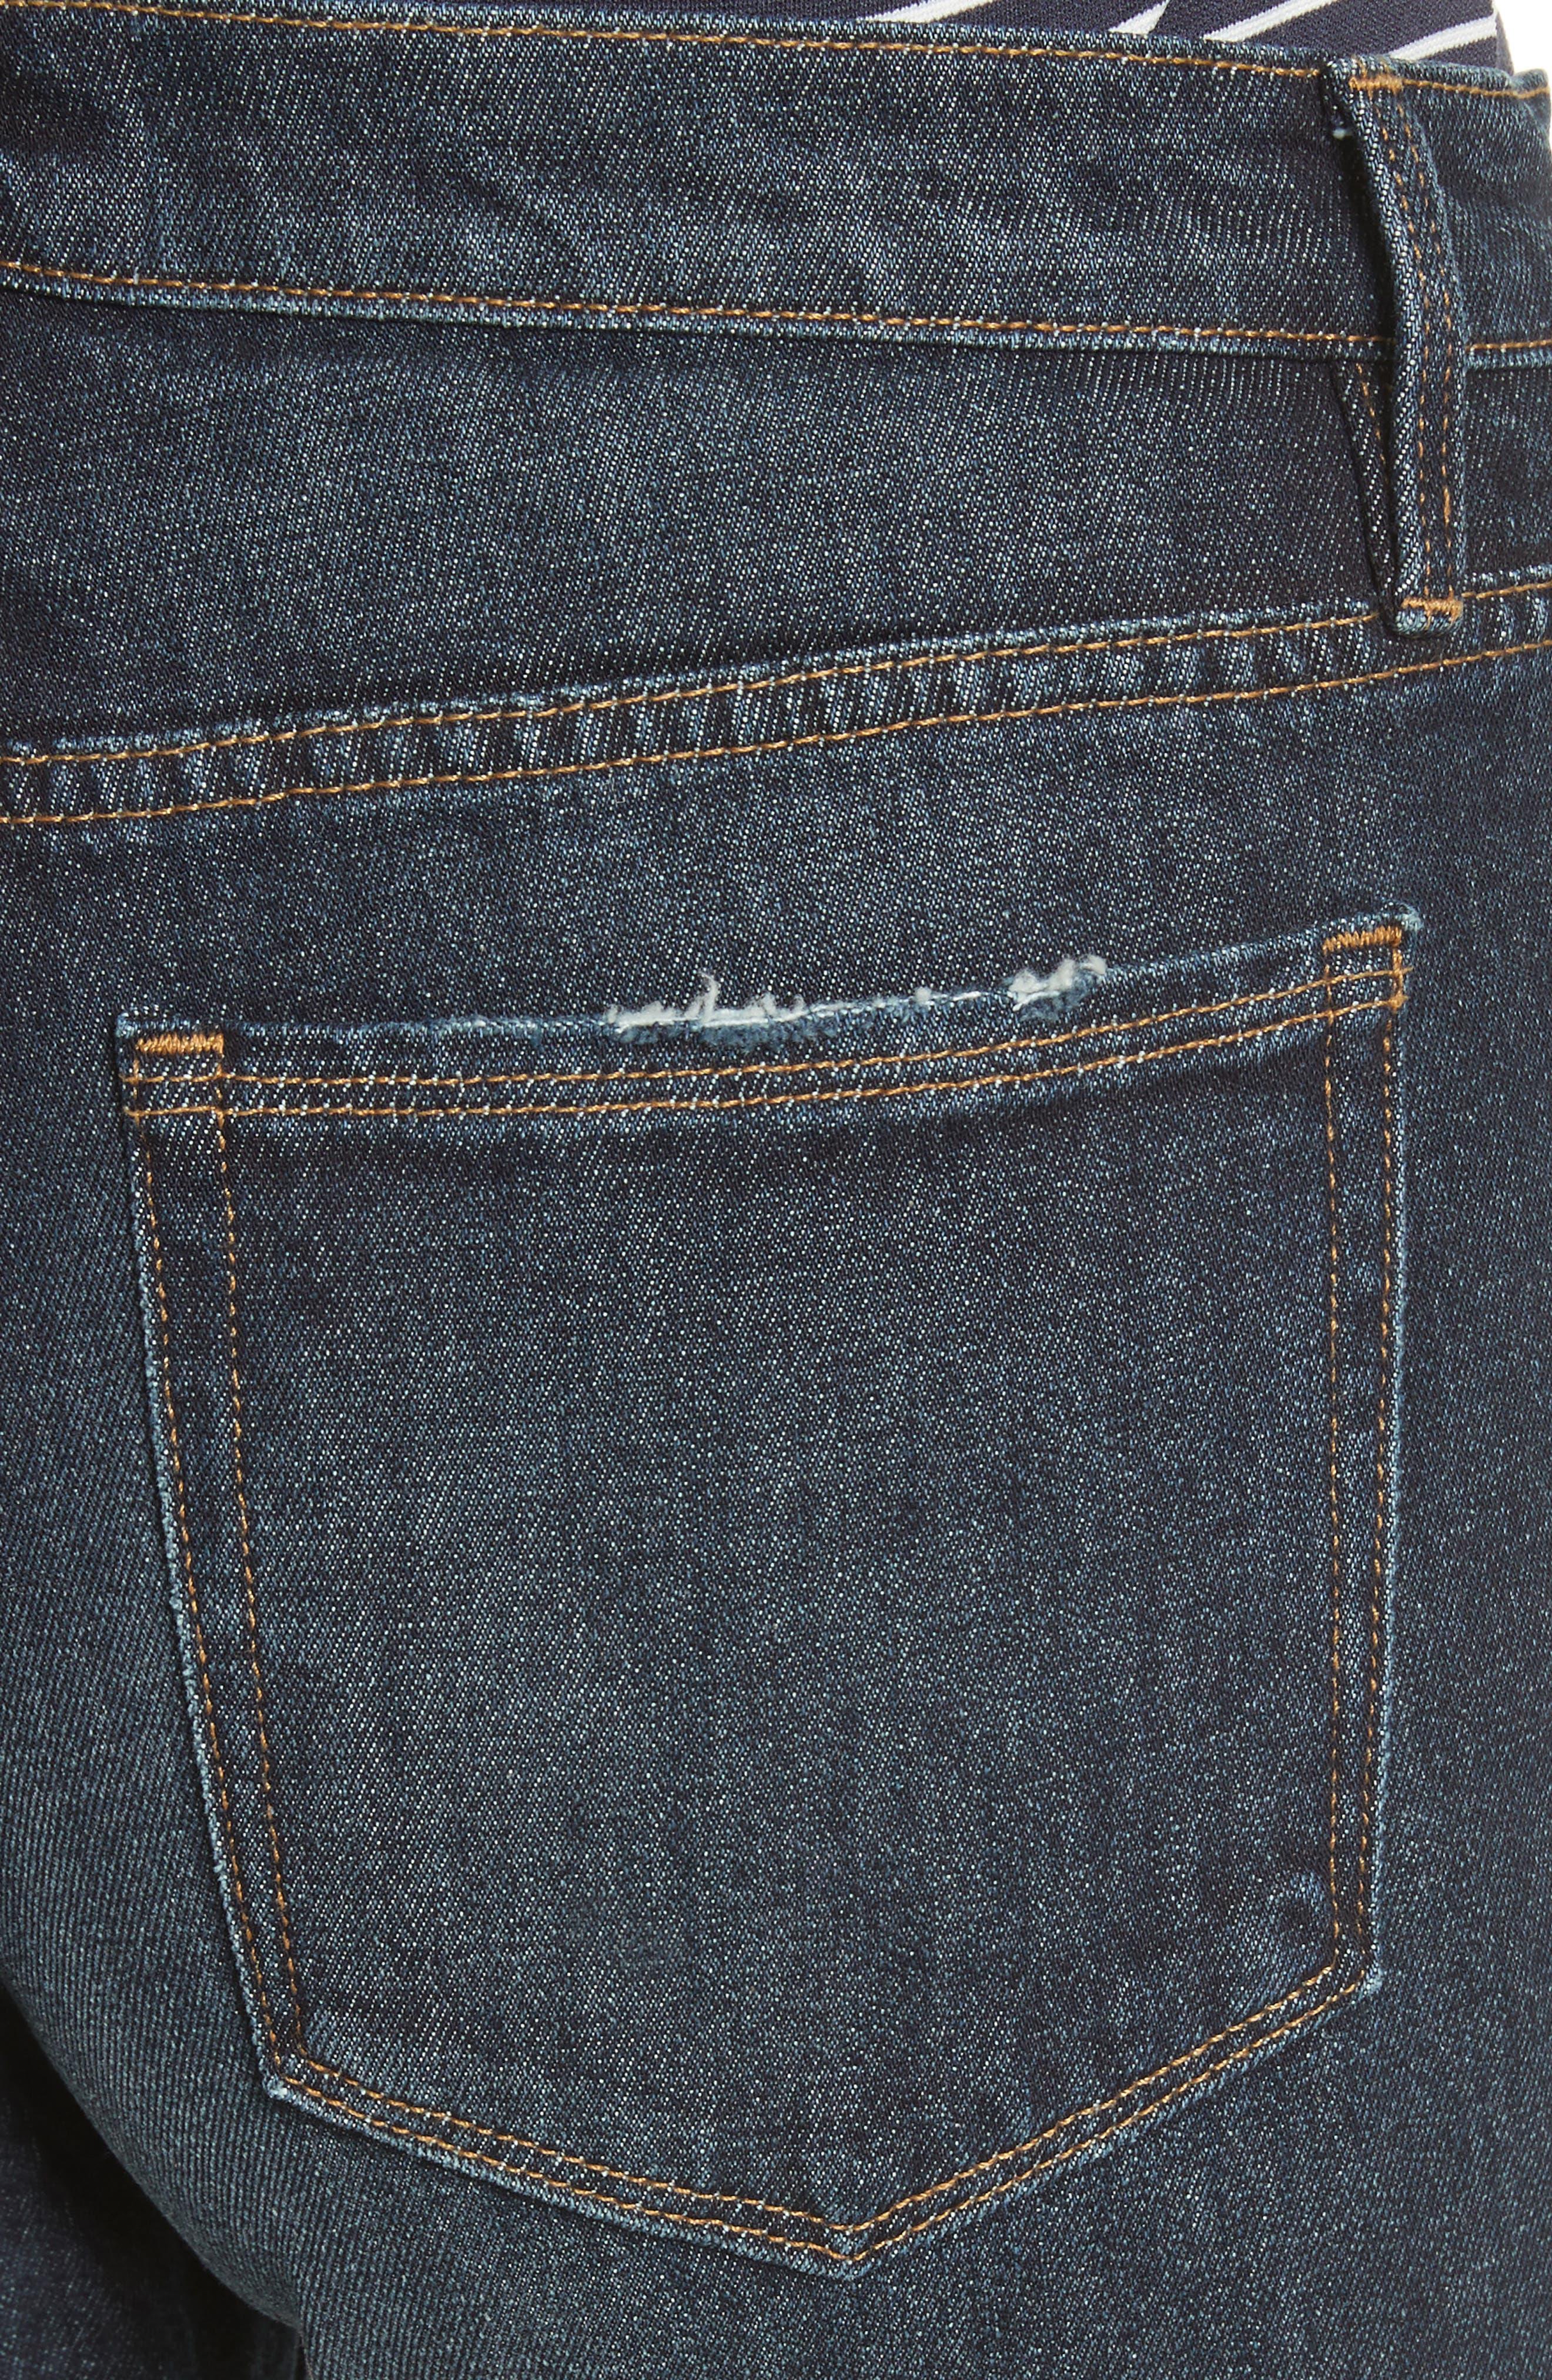 Straight Leg Ankle Jeans,                             Alternate thumbnail 4, color,                             402